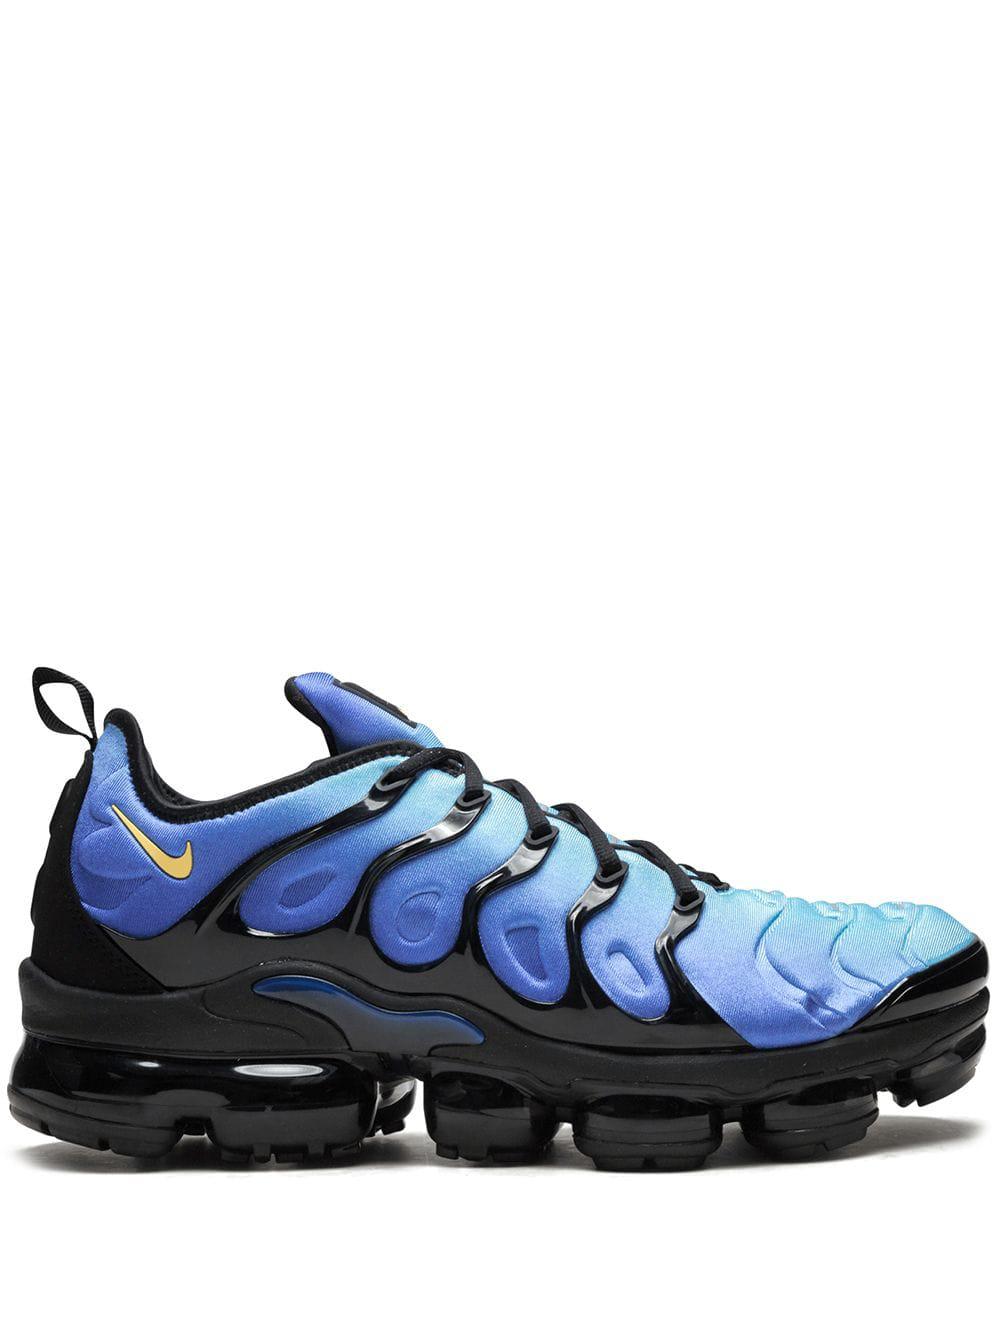 f1e6c75a89e1d Nike Air Vapormax Plus Sneakers - Blue